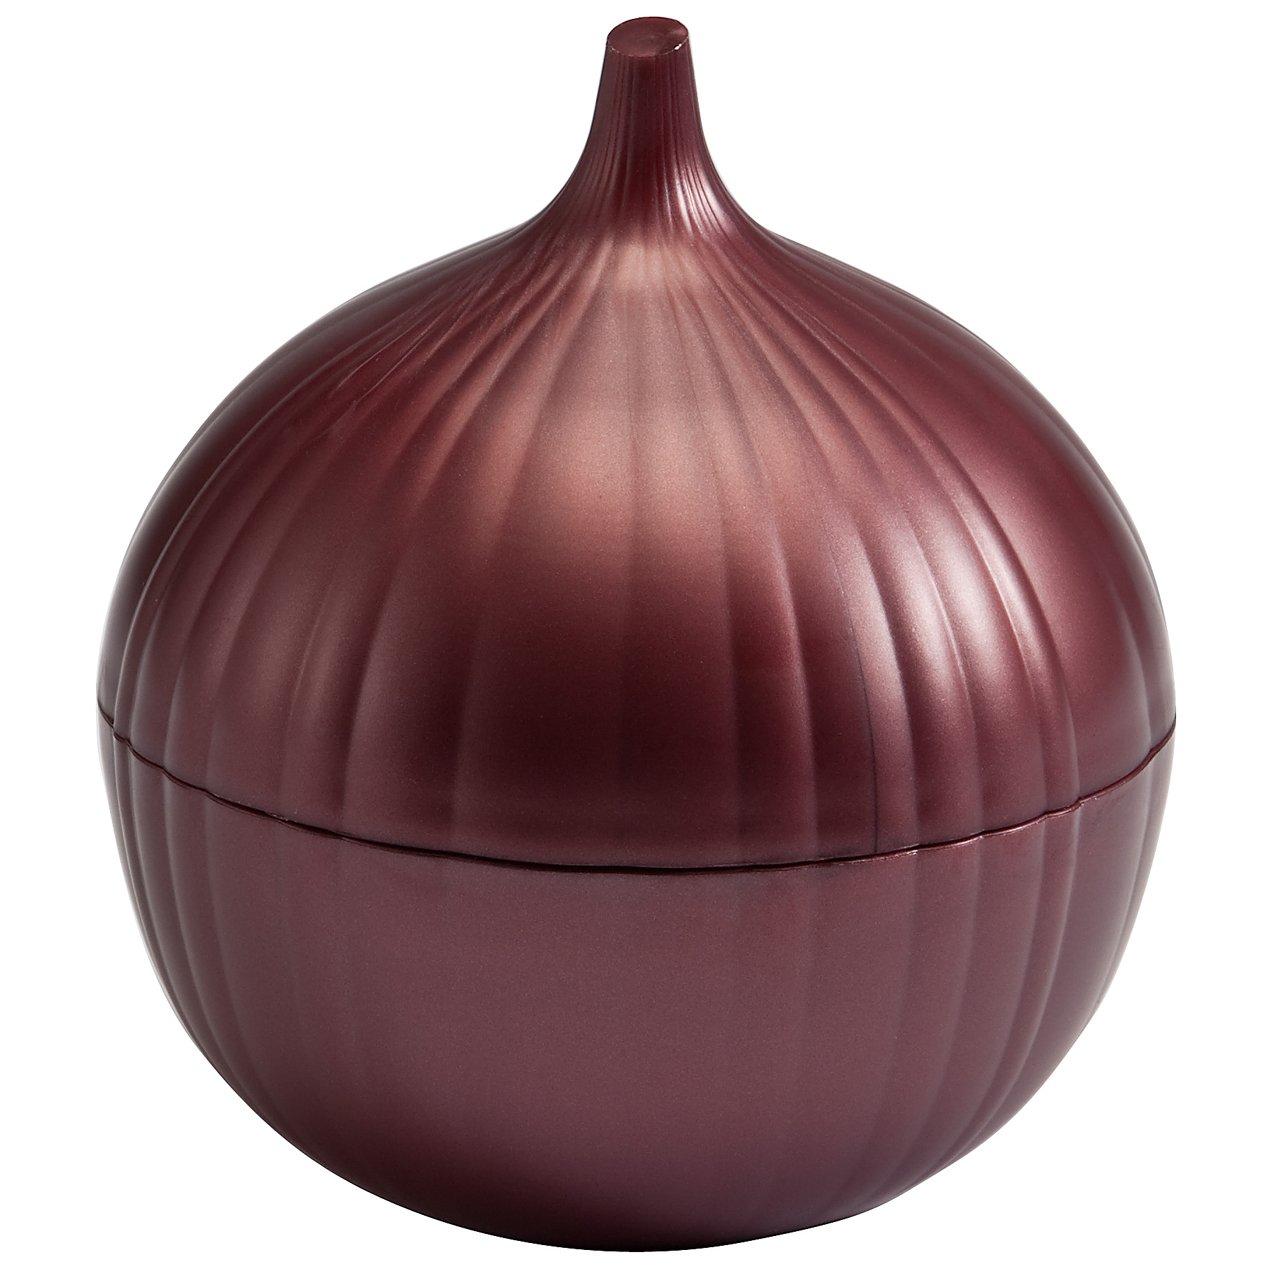 Hutzler Onion Saver, Red